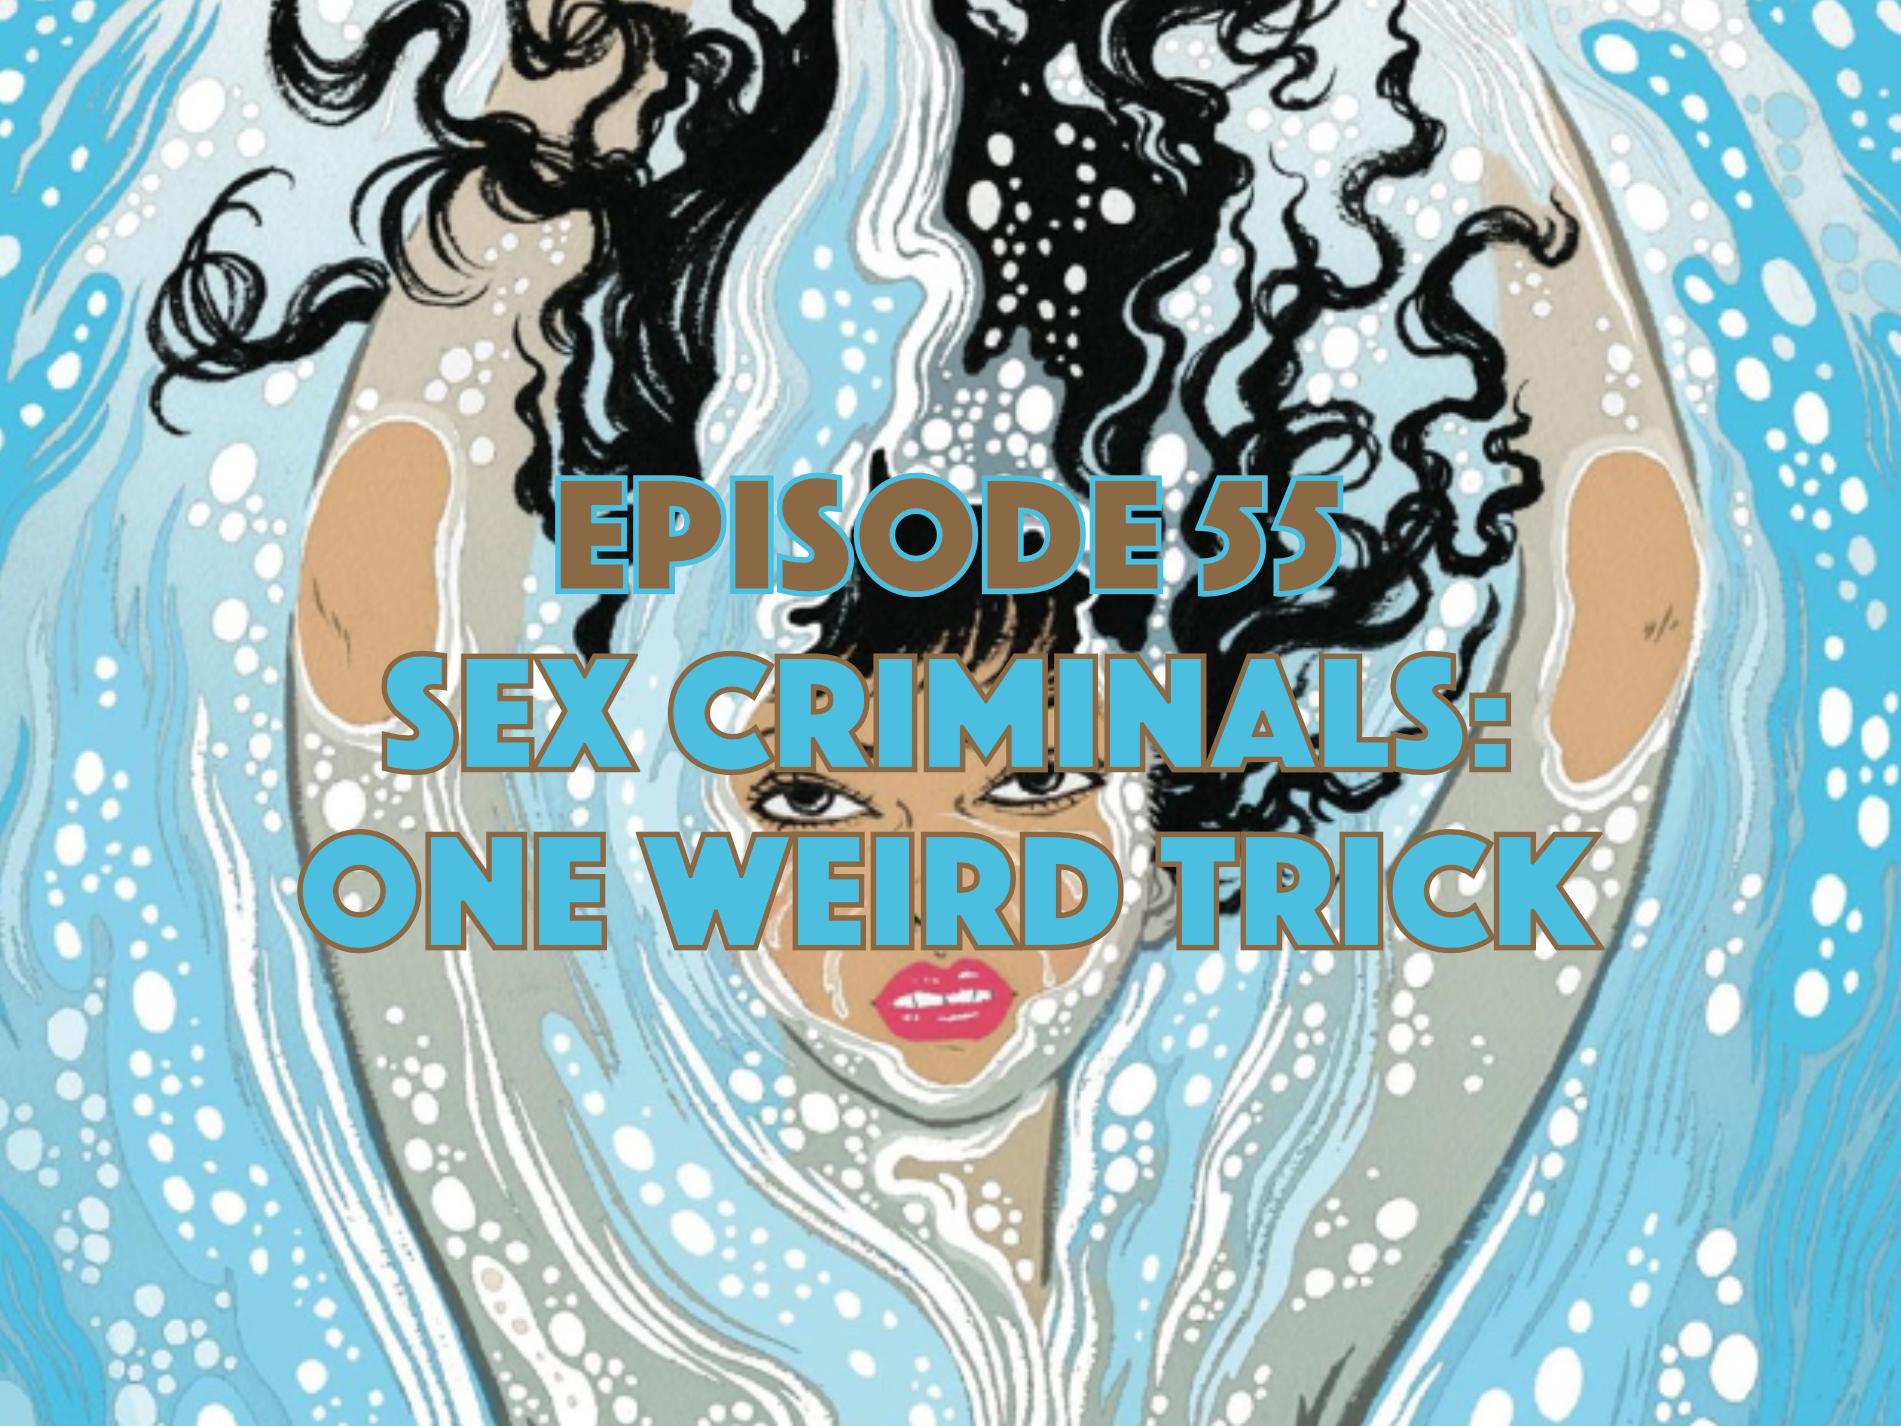 Sex Criminals, Graphic Novel Explorers Club, Comic Book Podcast, Graphic Novel Podcast